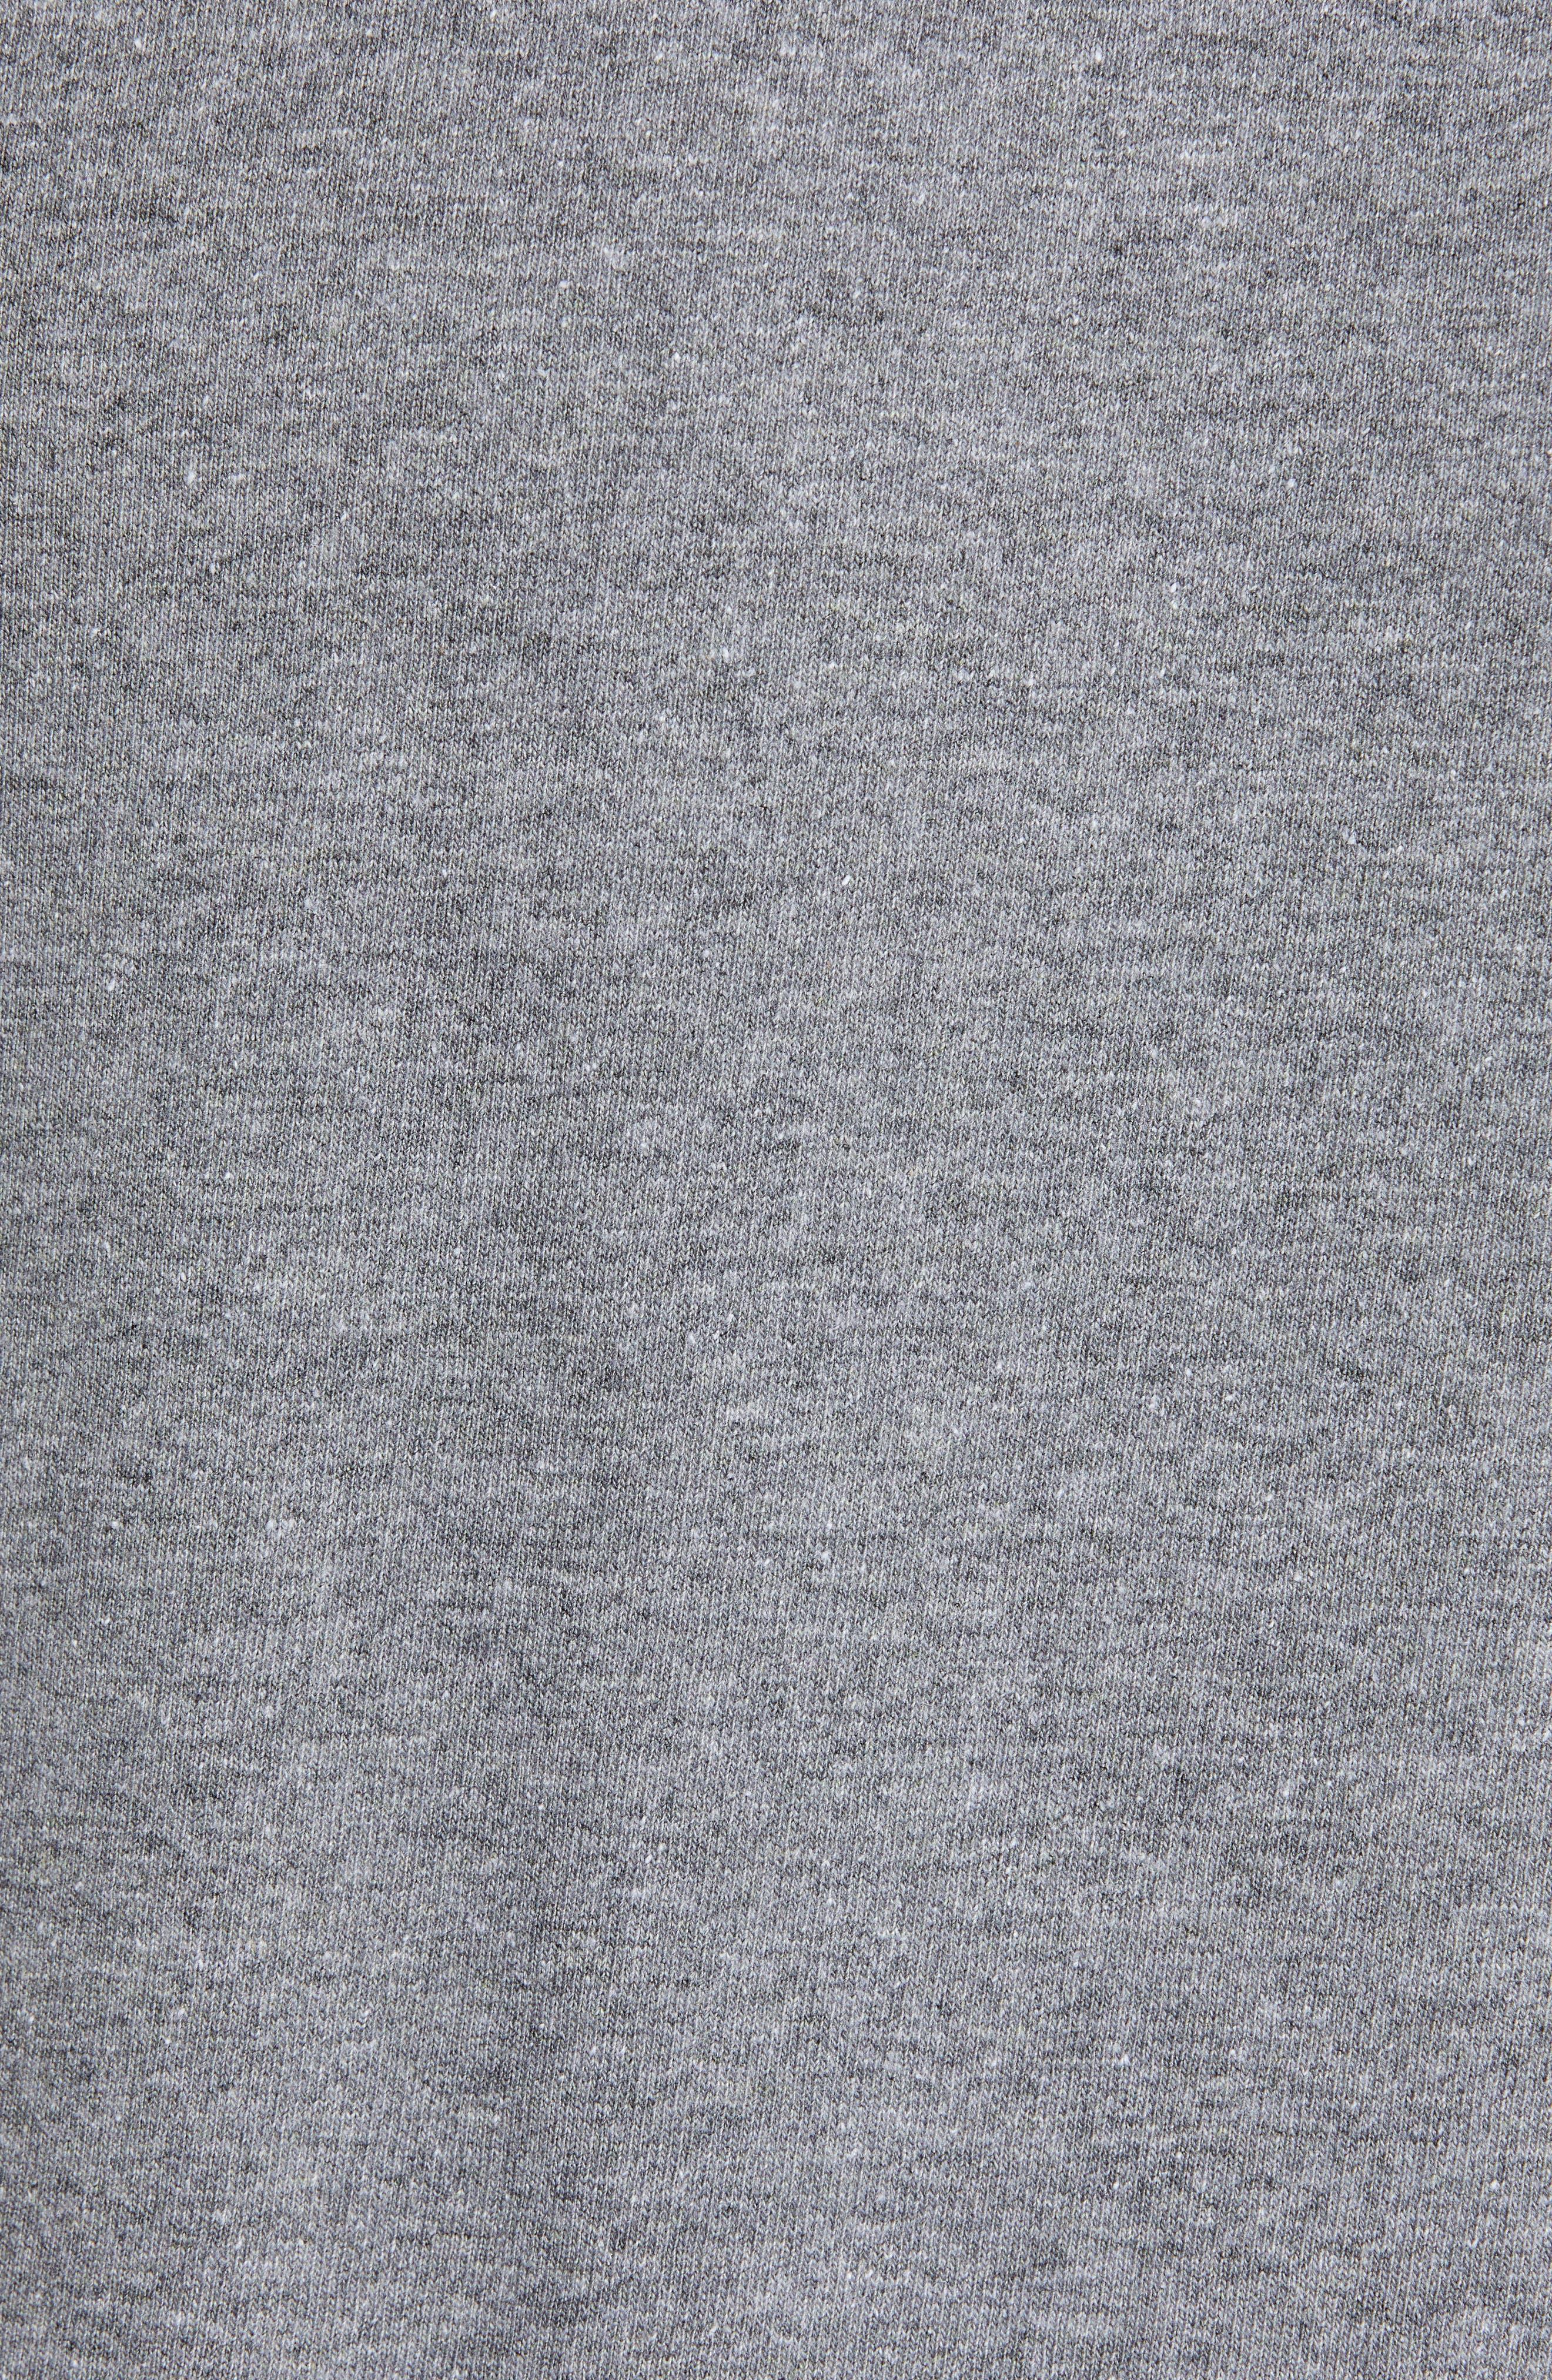 PATAGONIA,                             Fitz Roy Trout Crewneck T-Shirt,                             Alternate thumbnail 5, color,                             GRAVEL HEATHER